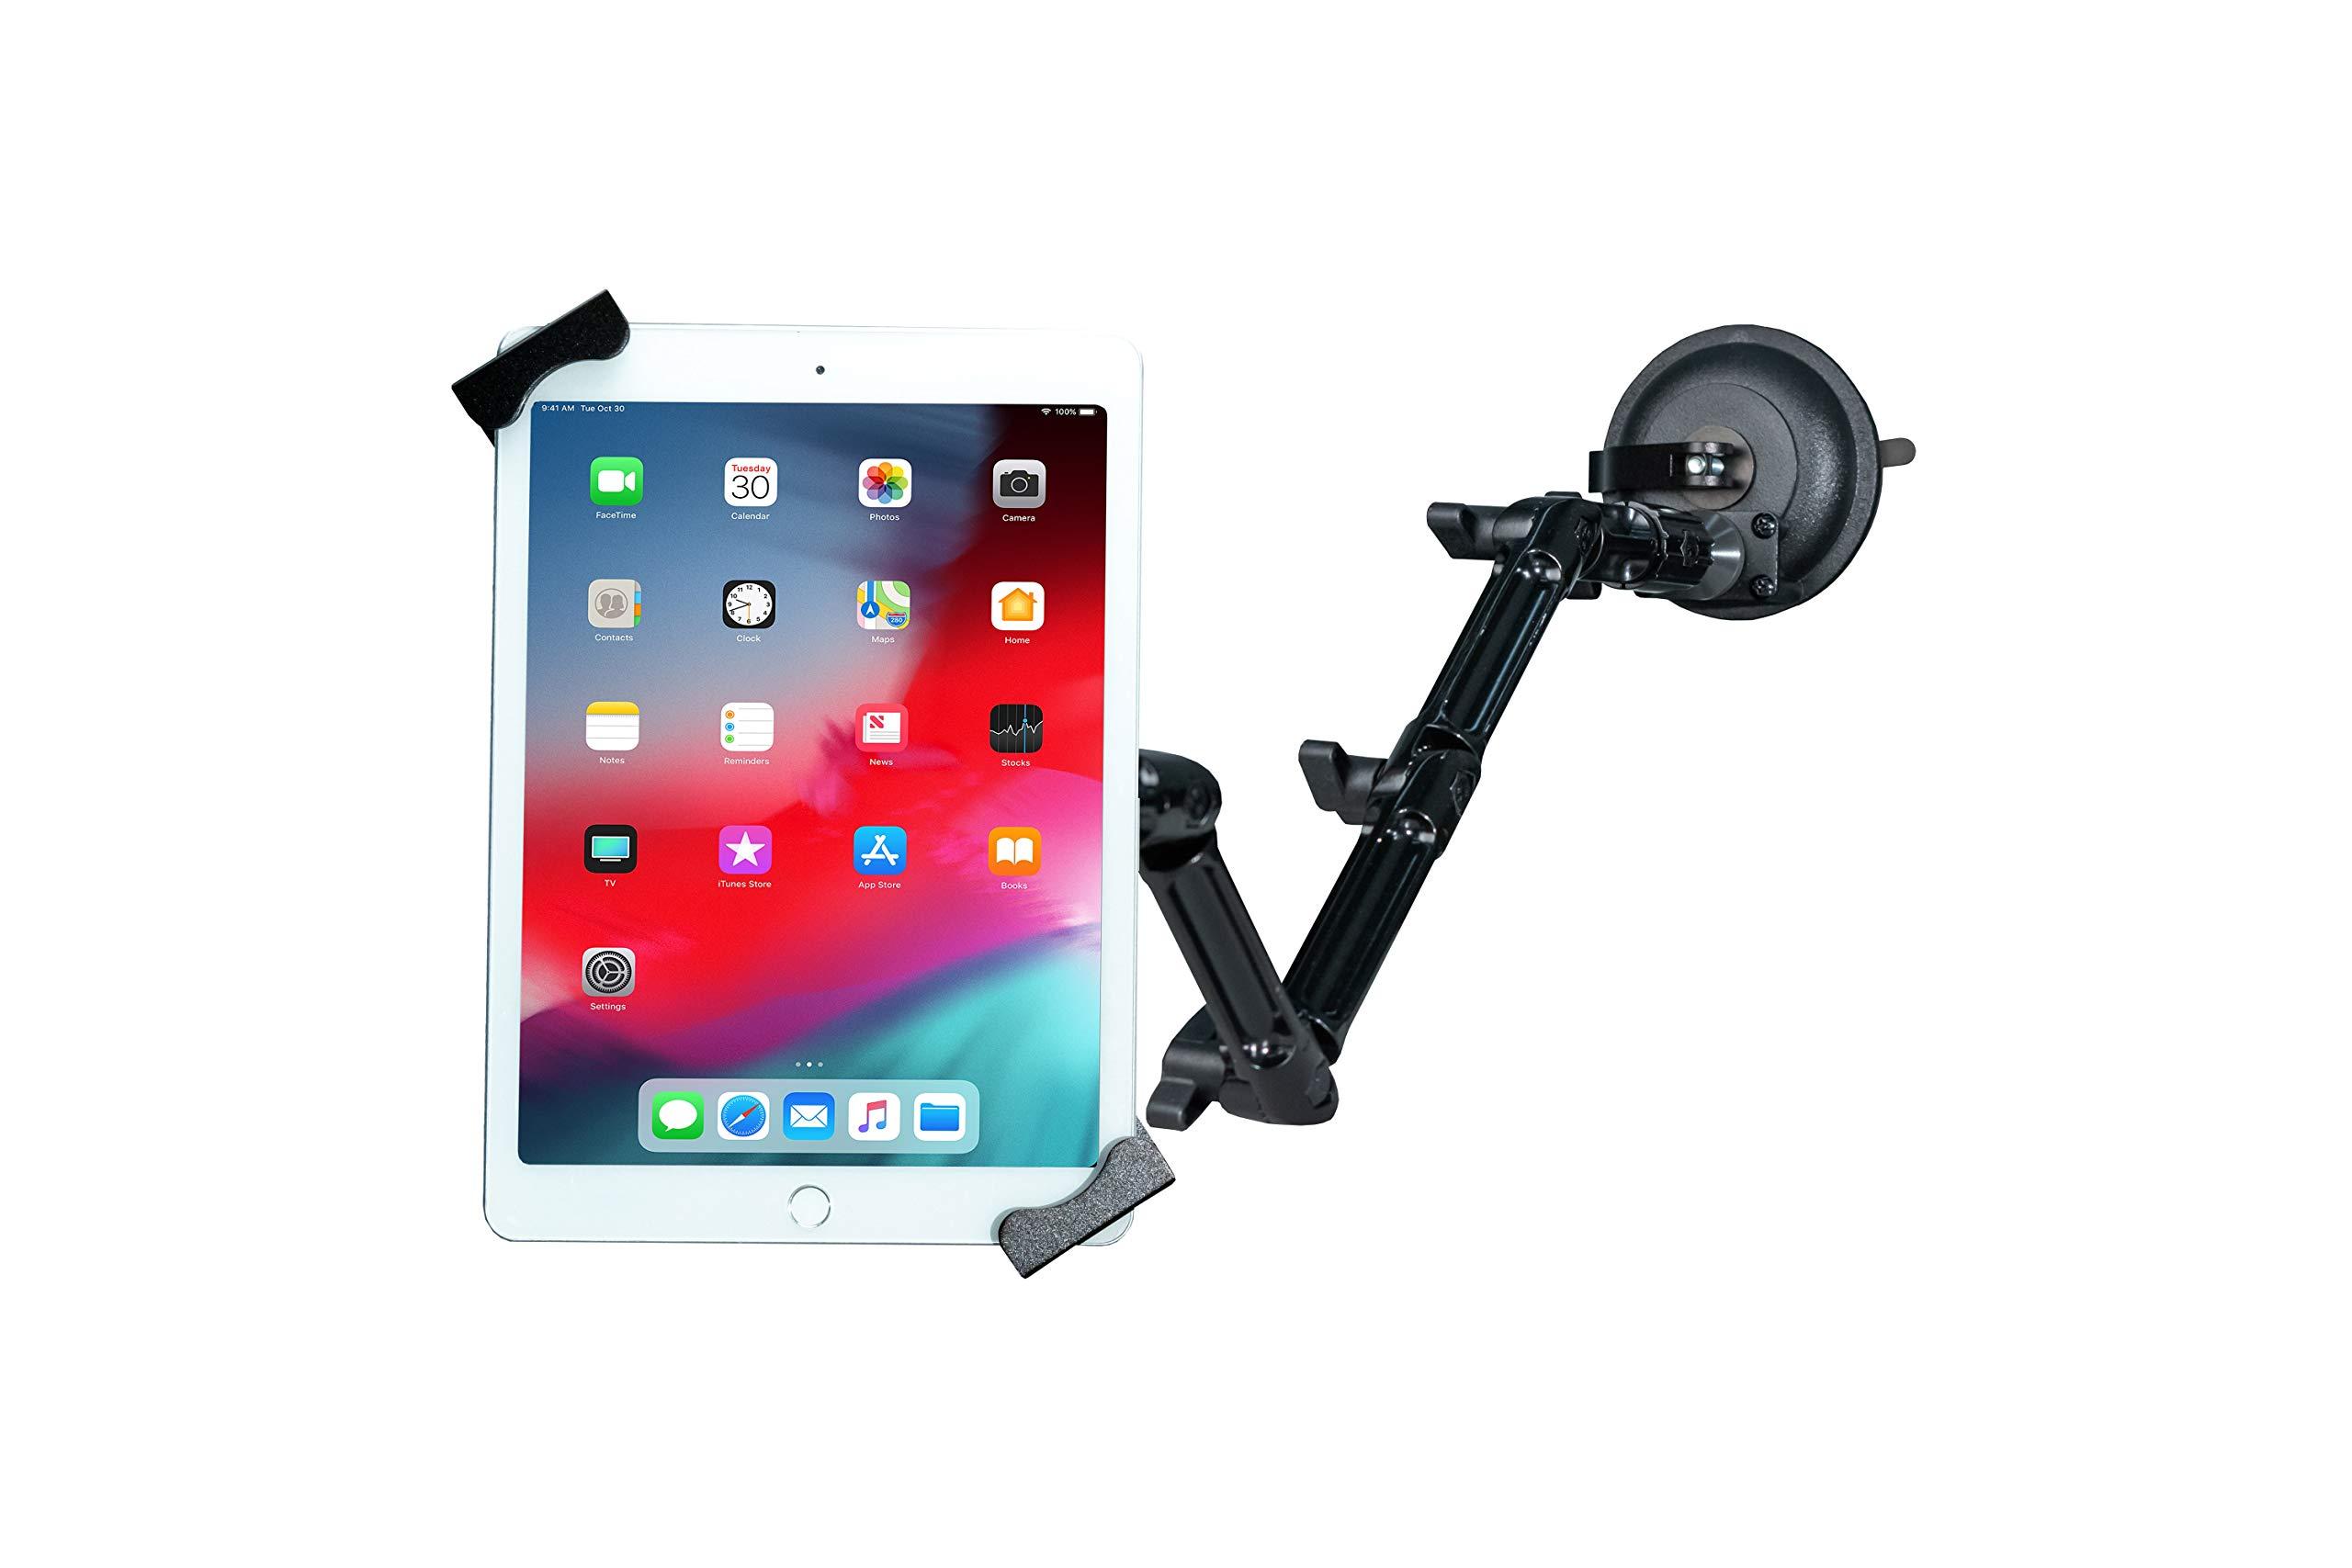 "Tablet Mount, CTA Digital Custom Flex Security Suction Mount for 7-14"" Tablets/iPad 10.2-Inch (7th Gen.), iPad Air 3, iPad Mini 5, 12.9-Inch iPad Pro, 11-Inch iPad Pro, iPad Gen 6 & More"